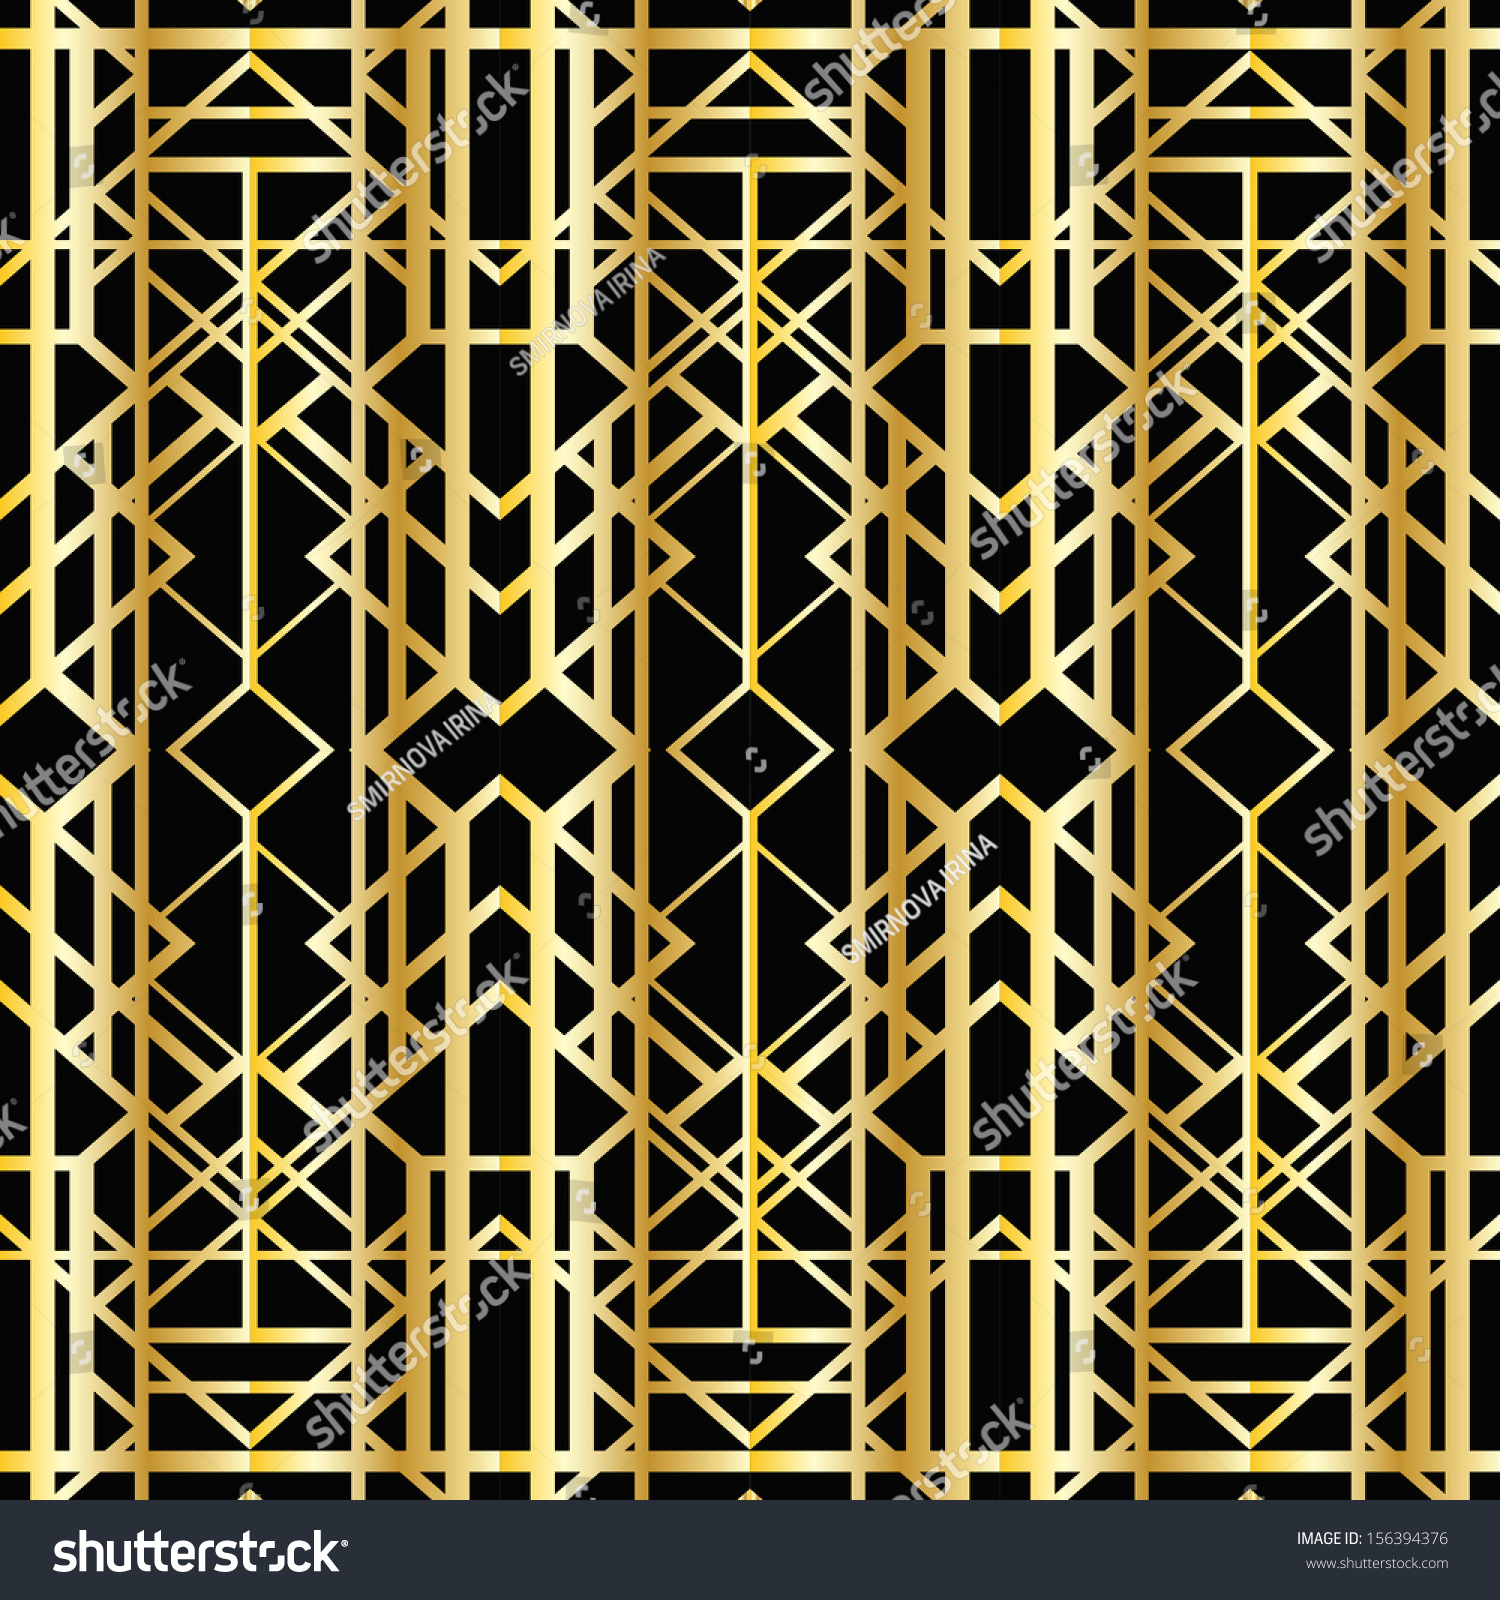 abstract-geometric-pattern-interwoven-volumetric-grid-lines ...